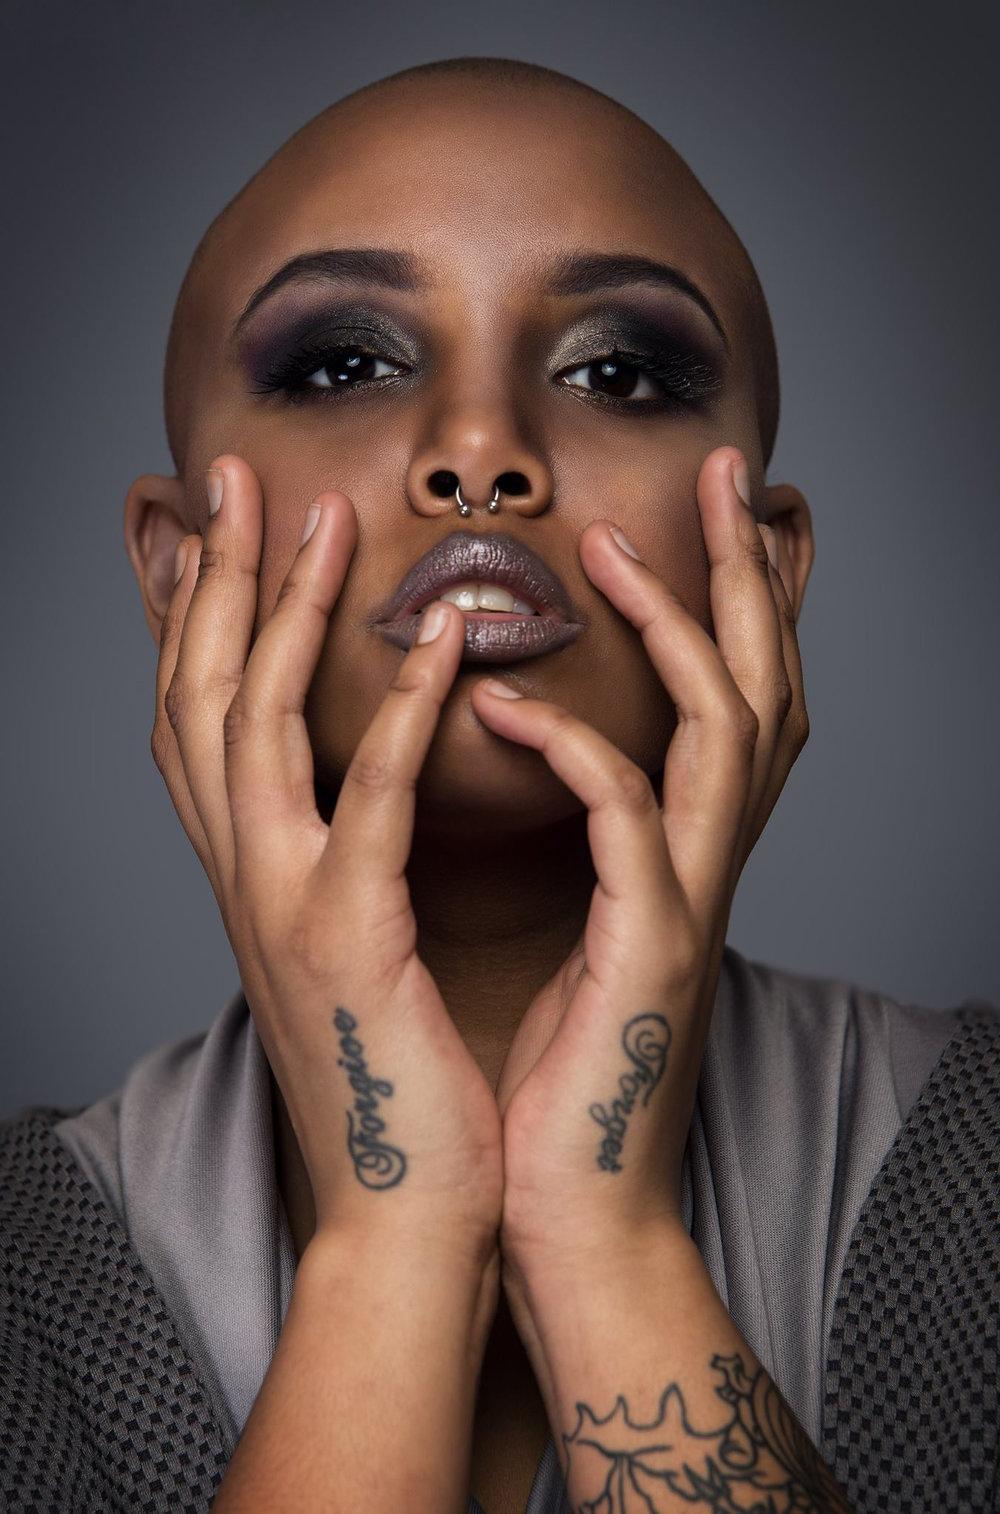 zaramia-ava-zaramiaava-leeds-fashion-designer-ethical-sustainable-grey-versatile-drape-wrap-grey-cowl-aya-dress-styling-studio-womenswear-ayame-models-photoshoot-1